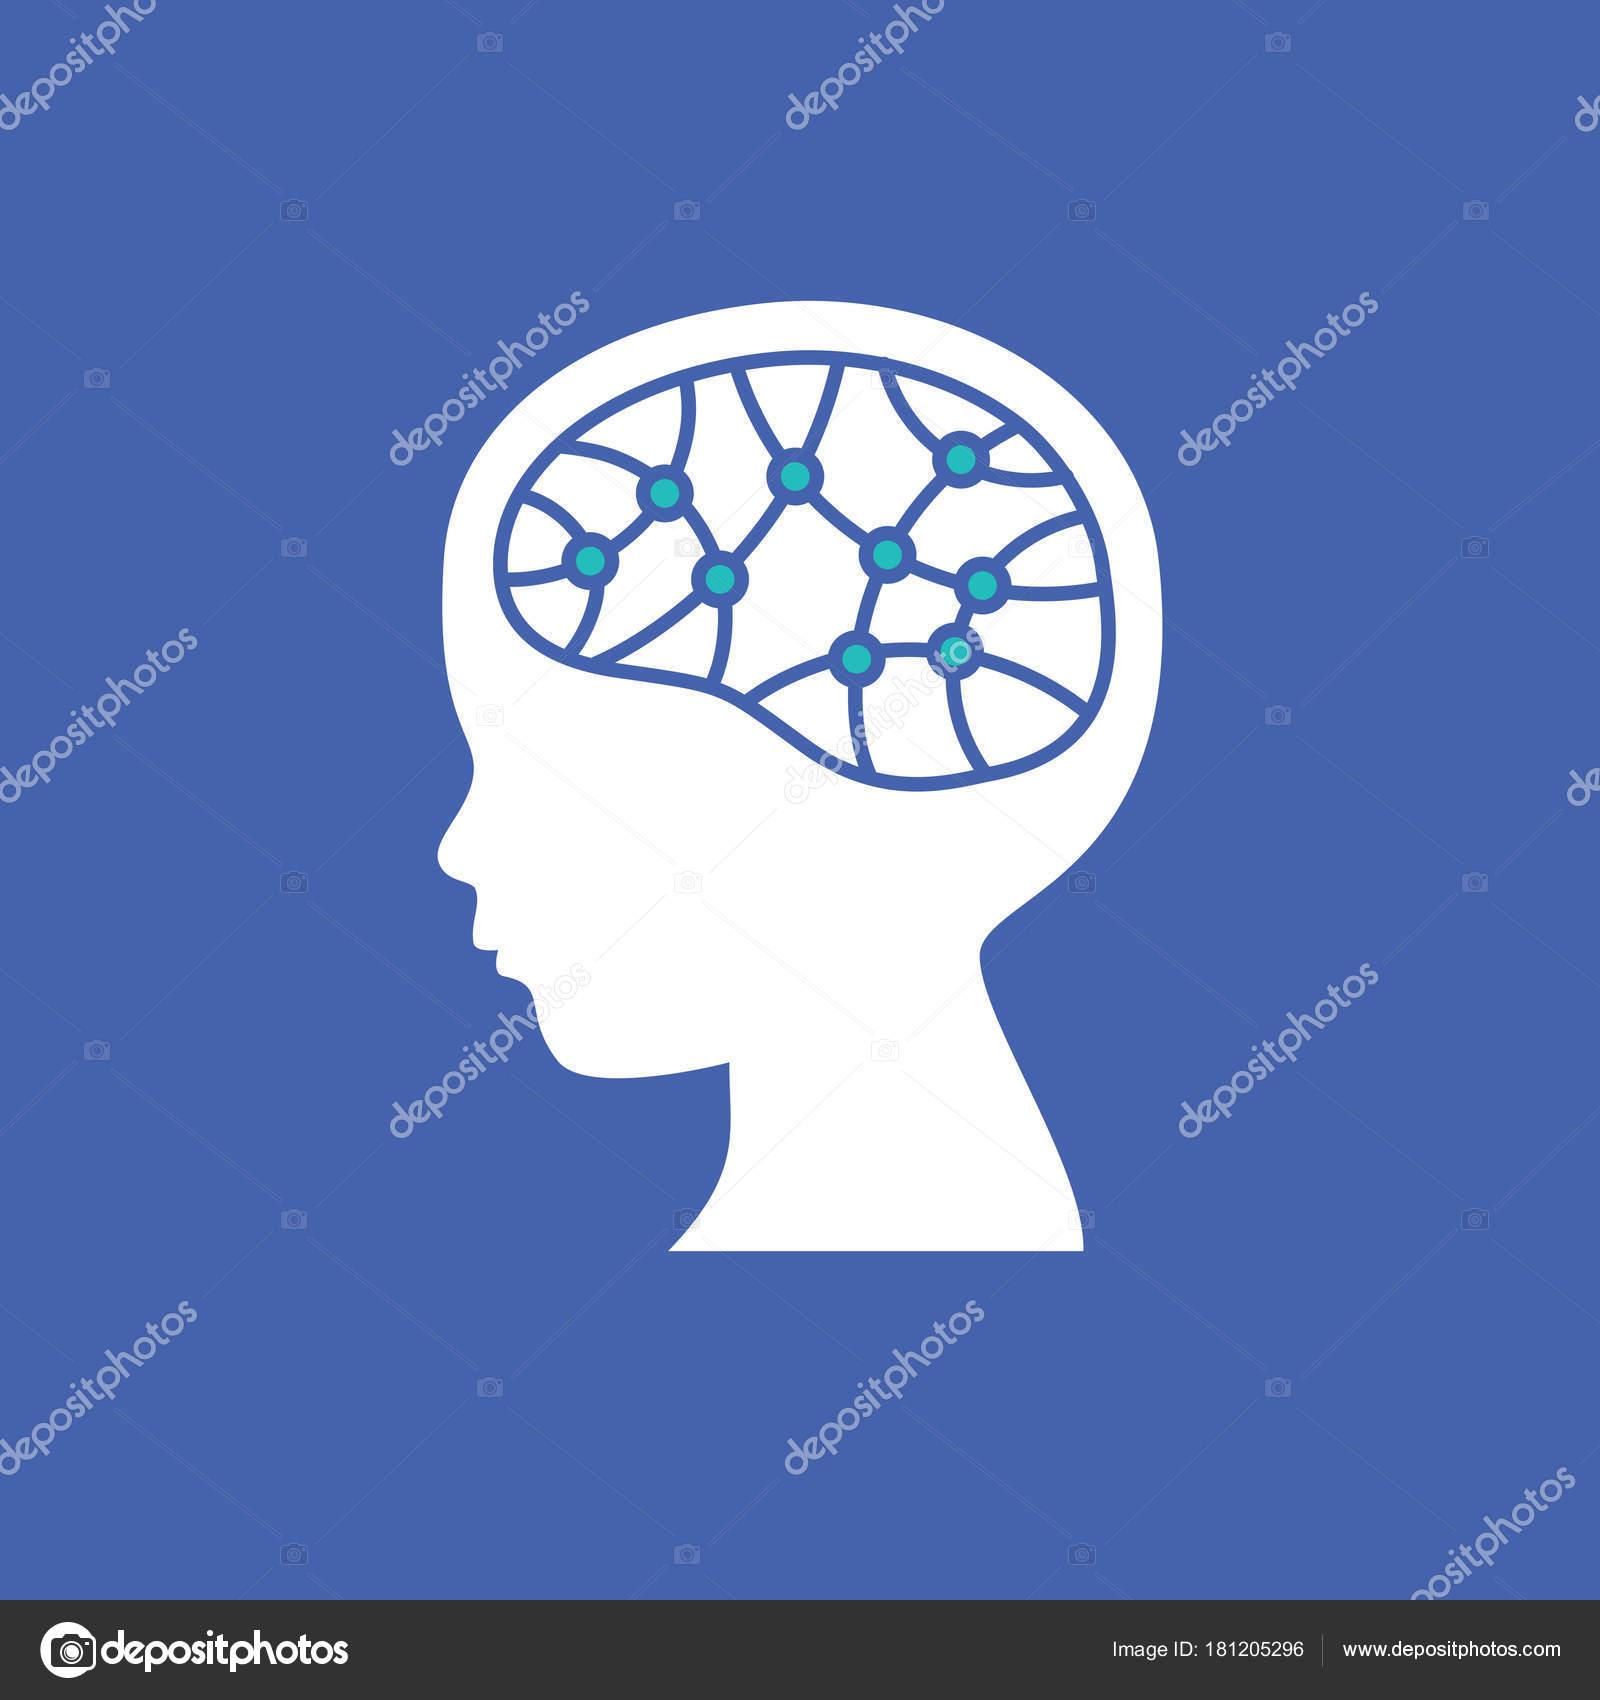 Child brain icon brain research creativity memory concept stock child brain icon brain research creativity memory concept stock vector biocorpaavc Images